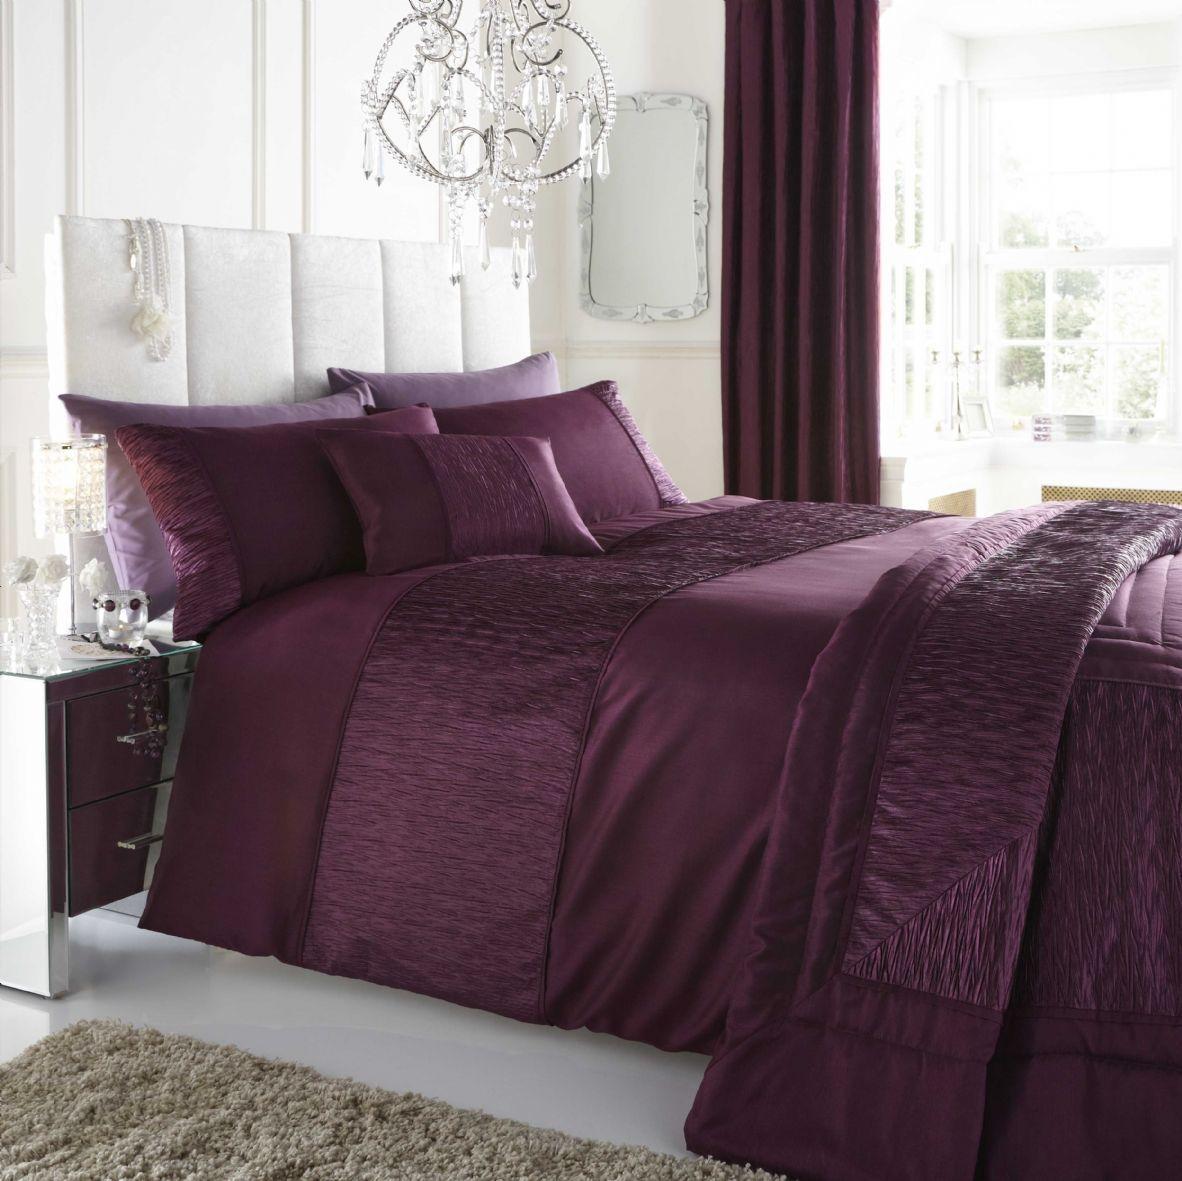 Best Purple Bedding Google Search Luxury Bedding Plum 640 x 480